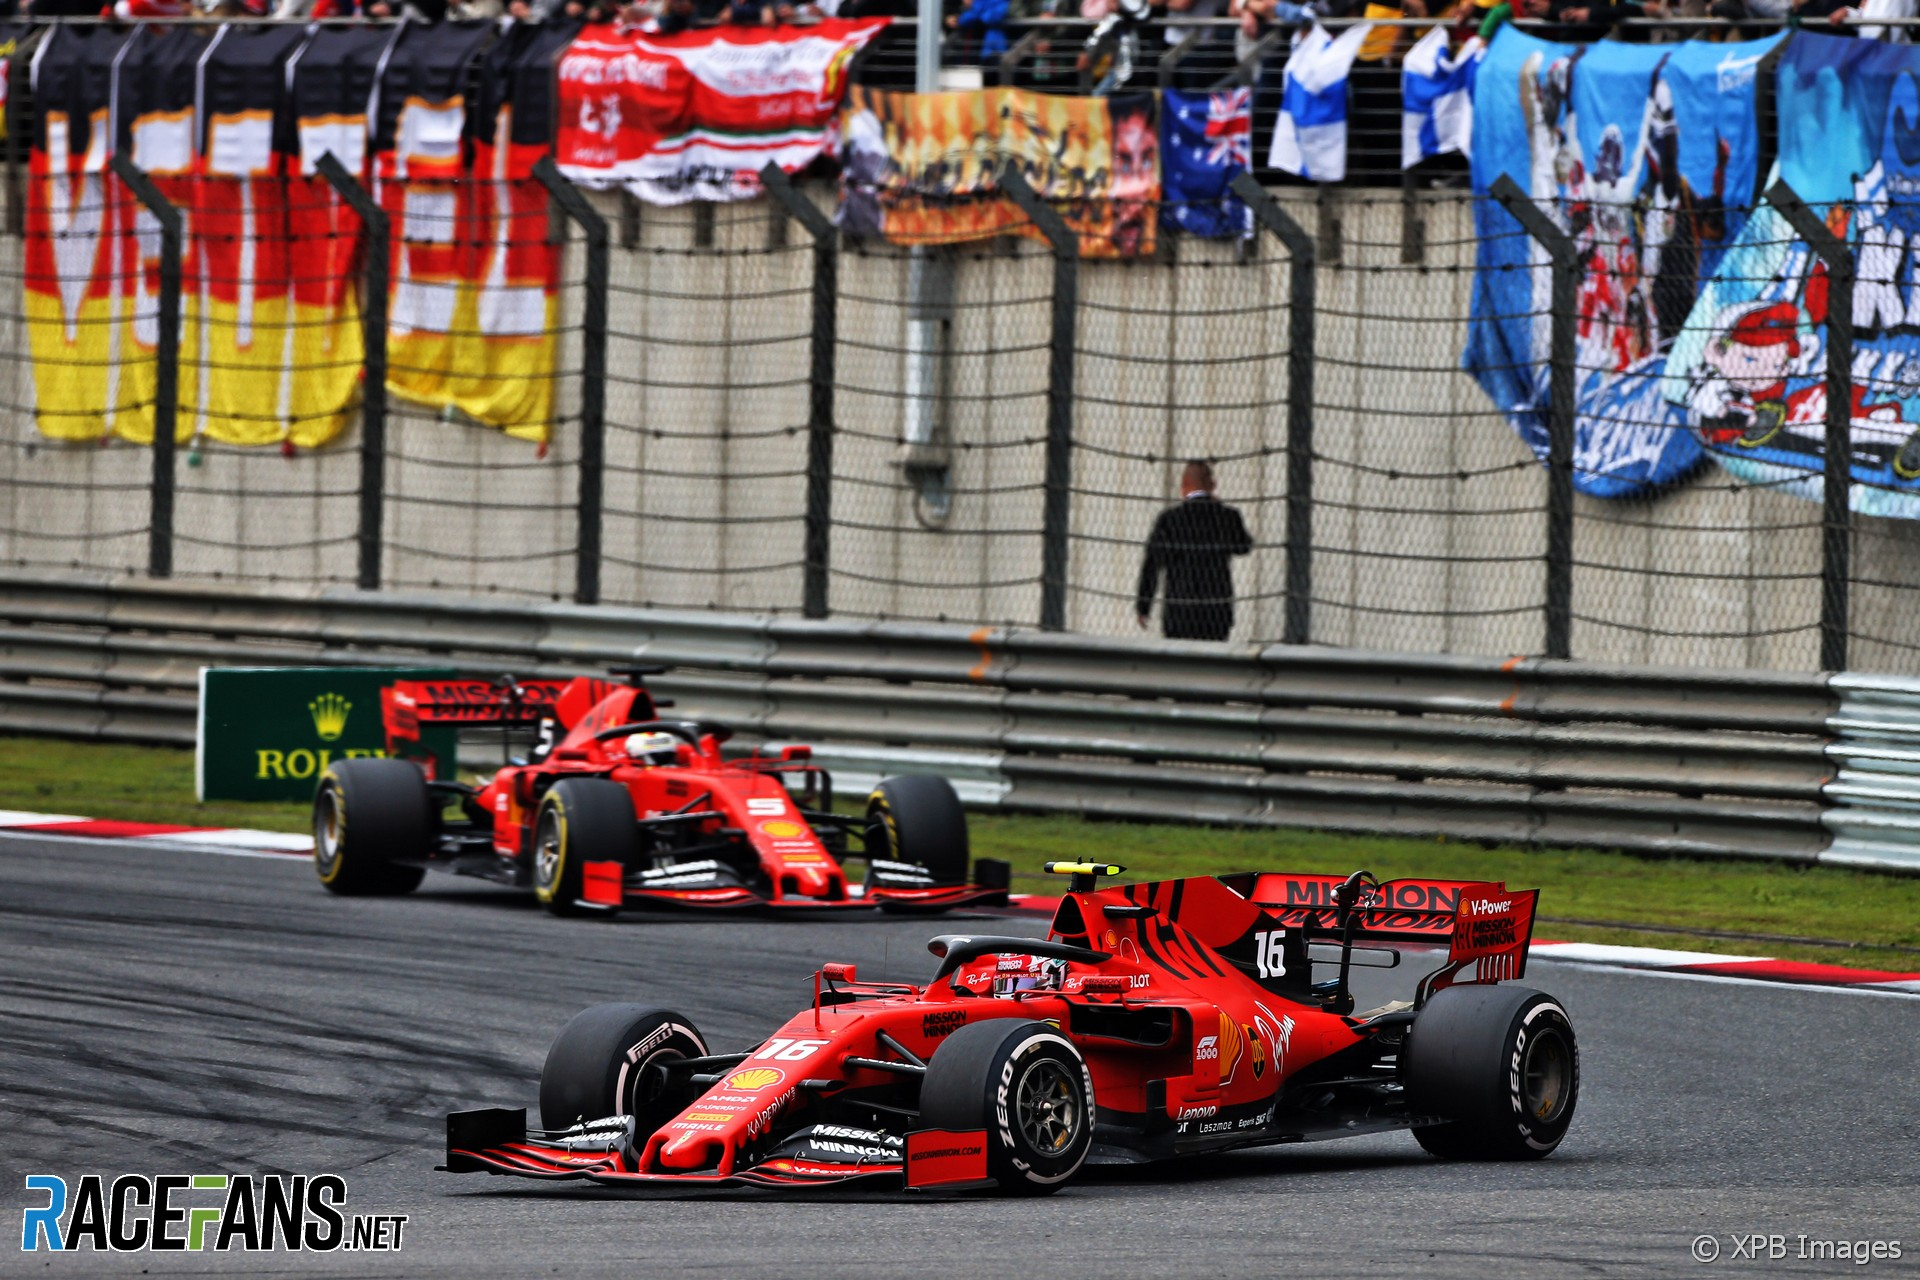 Charles Leclerc, Sebastian Vettel, Ferrari, Shanghai International Circuit, 2019